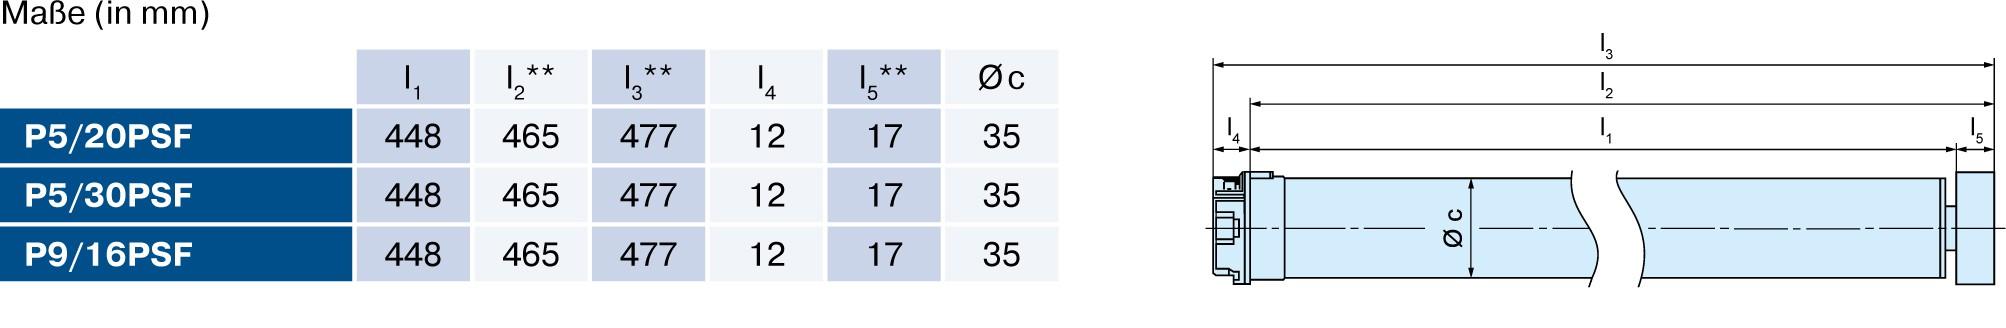 Becker P-PSF Maße